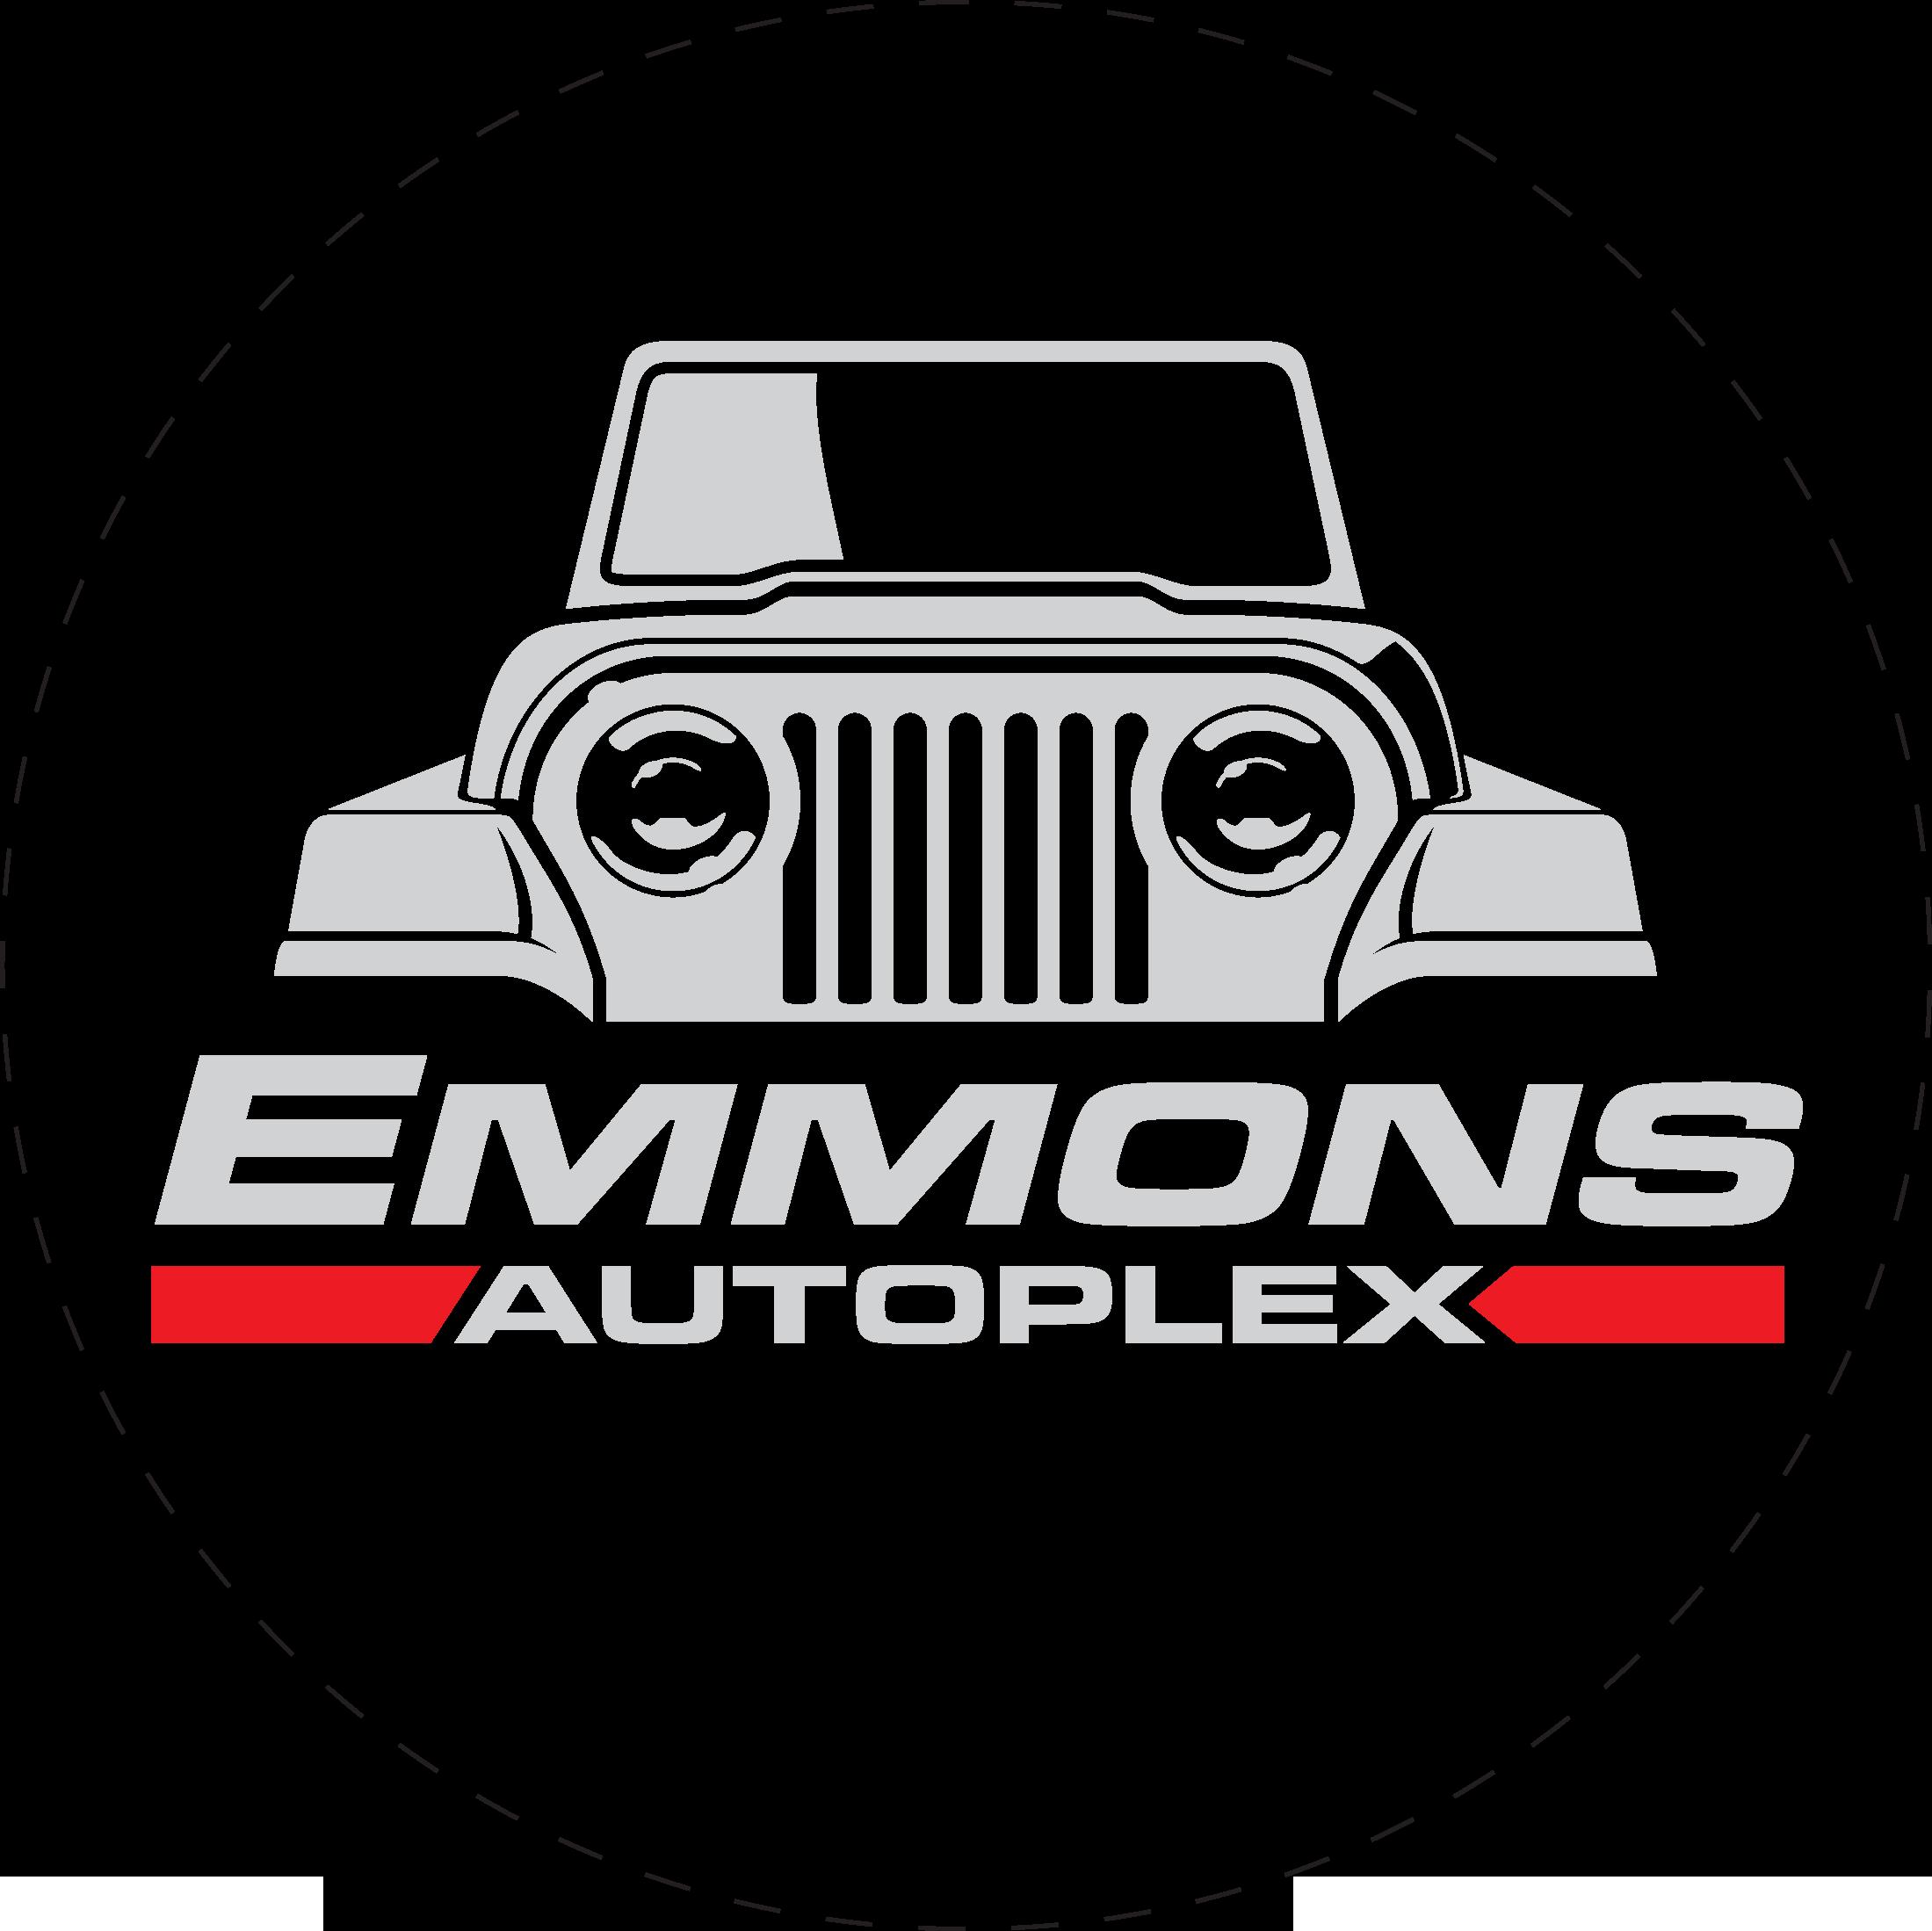 Emmons Autoplex